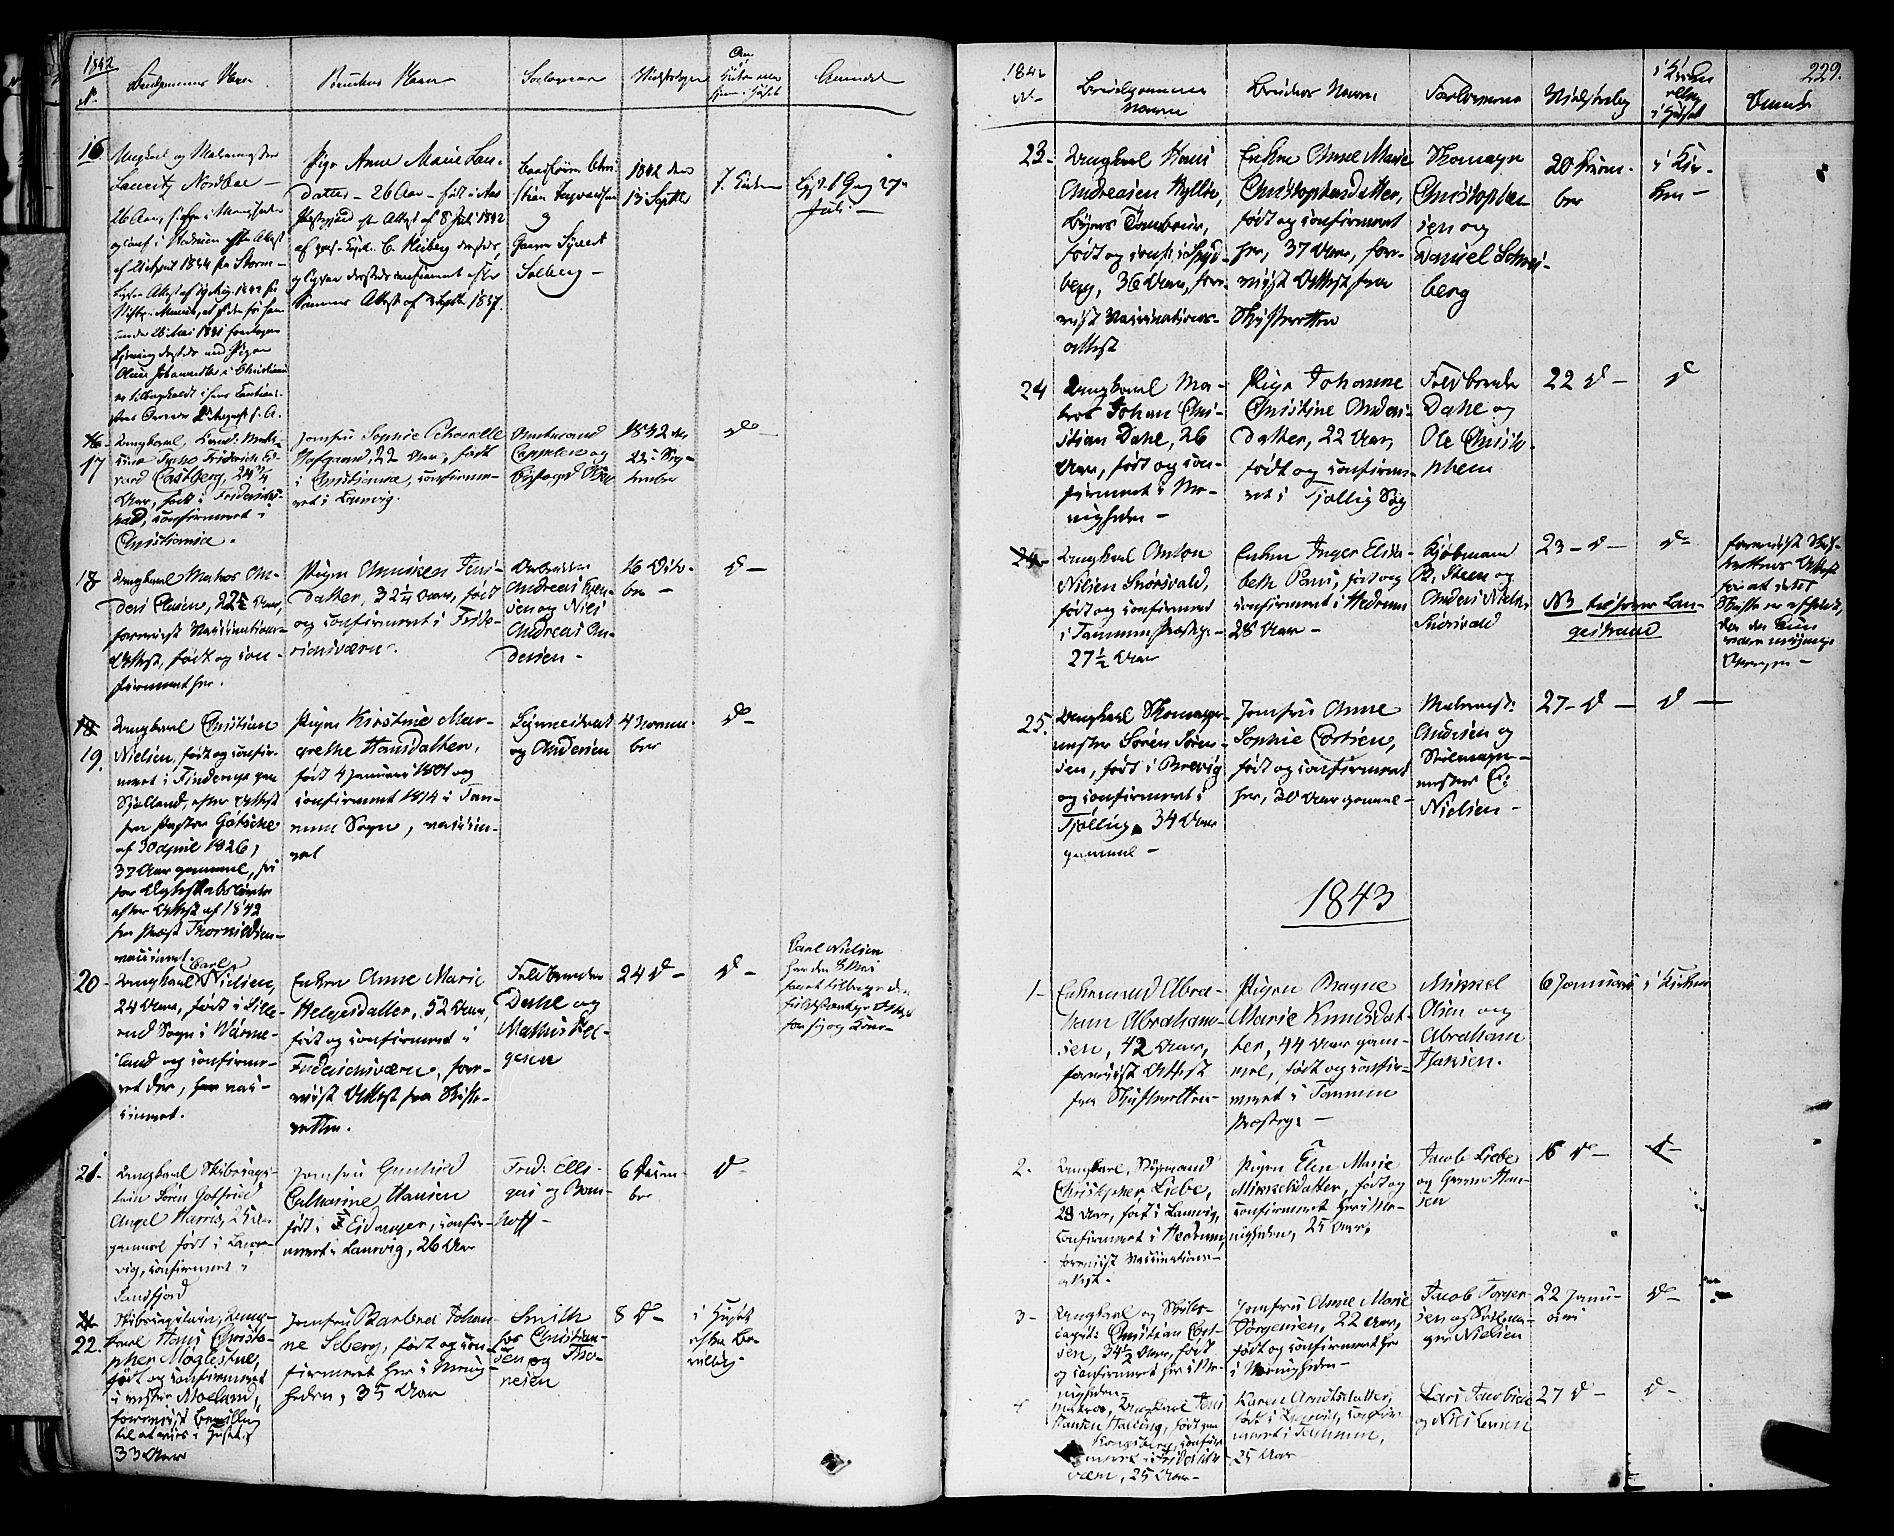 SAKO, Larvik kirkebøker, F/Fa/L0002: Ministerialbok nr. I 2, 1825-1847, s. 229